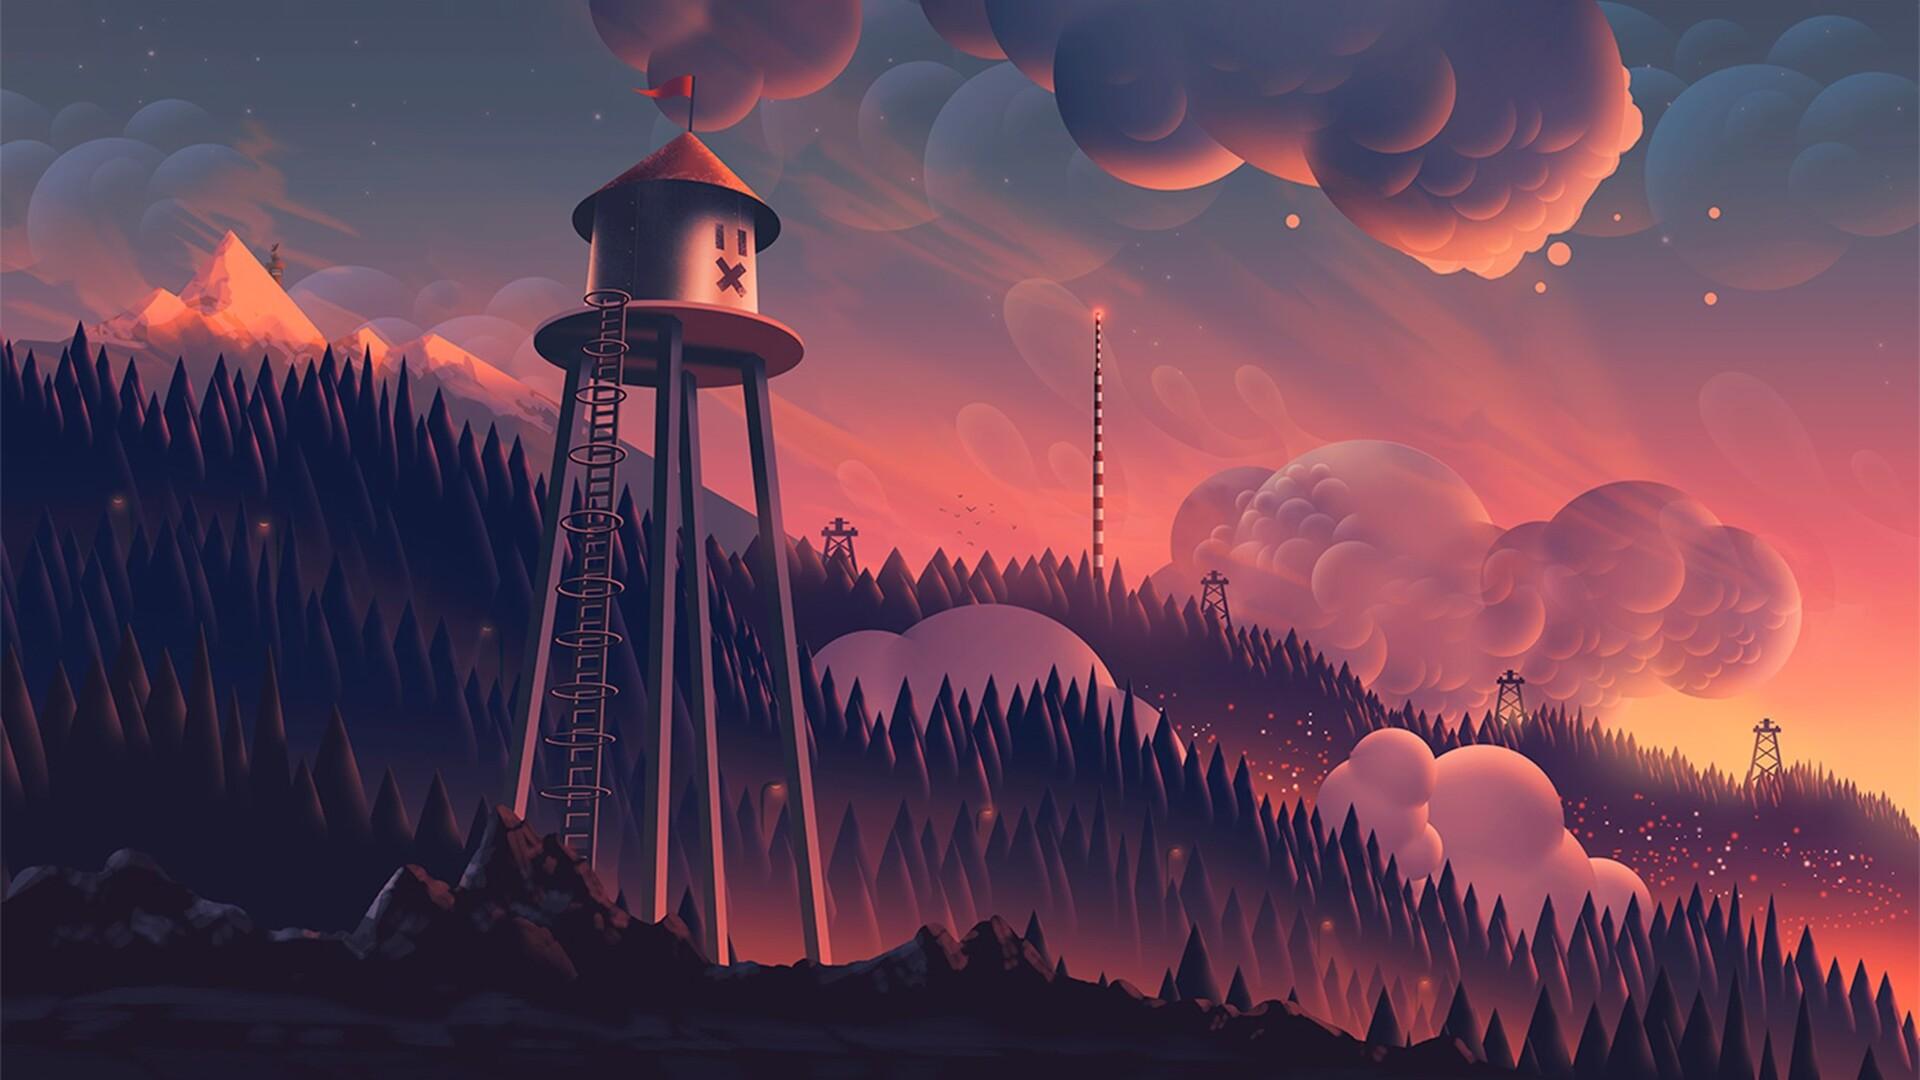 1920x1080 Watchtower Clouds Forest Mountain Landscape Digital Art